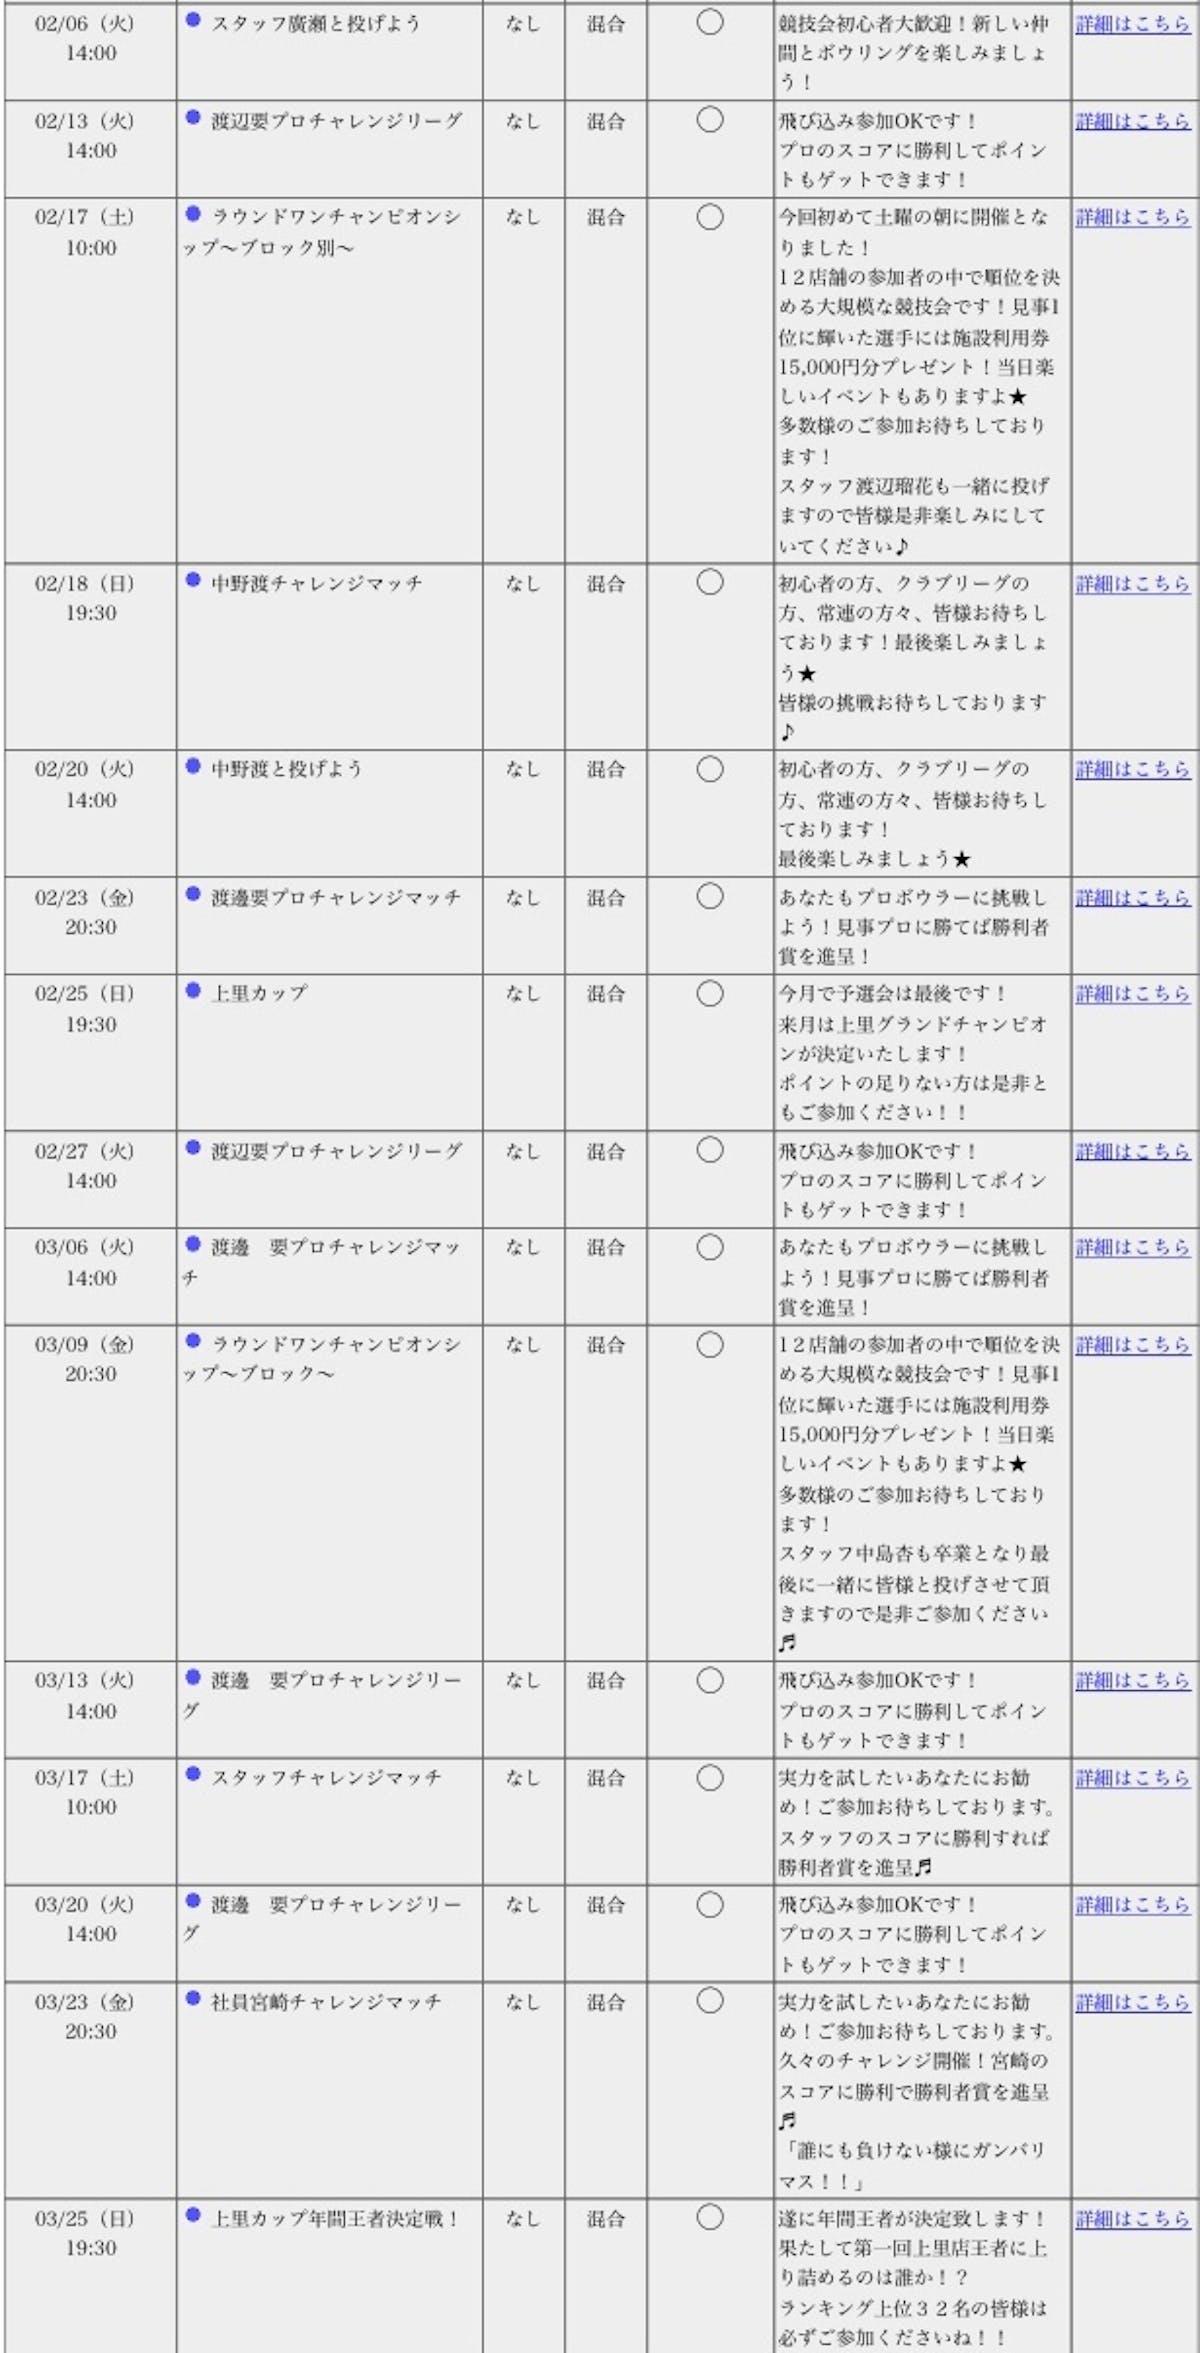 D1B34322-F86B-4532-A494-5A0EEC18D8A3.jpeg